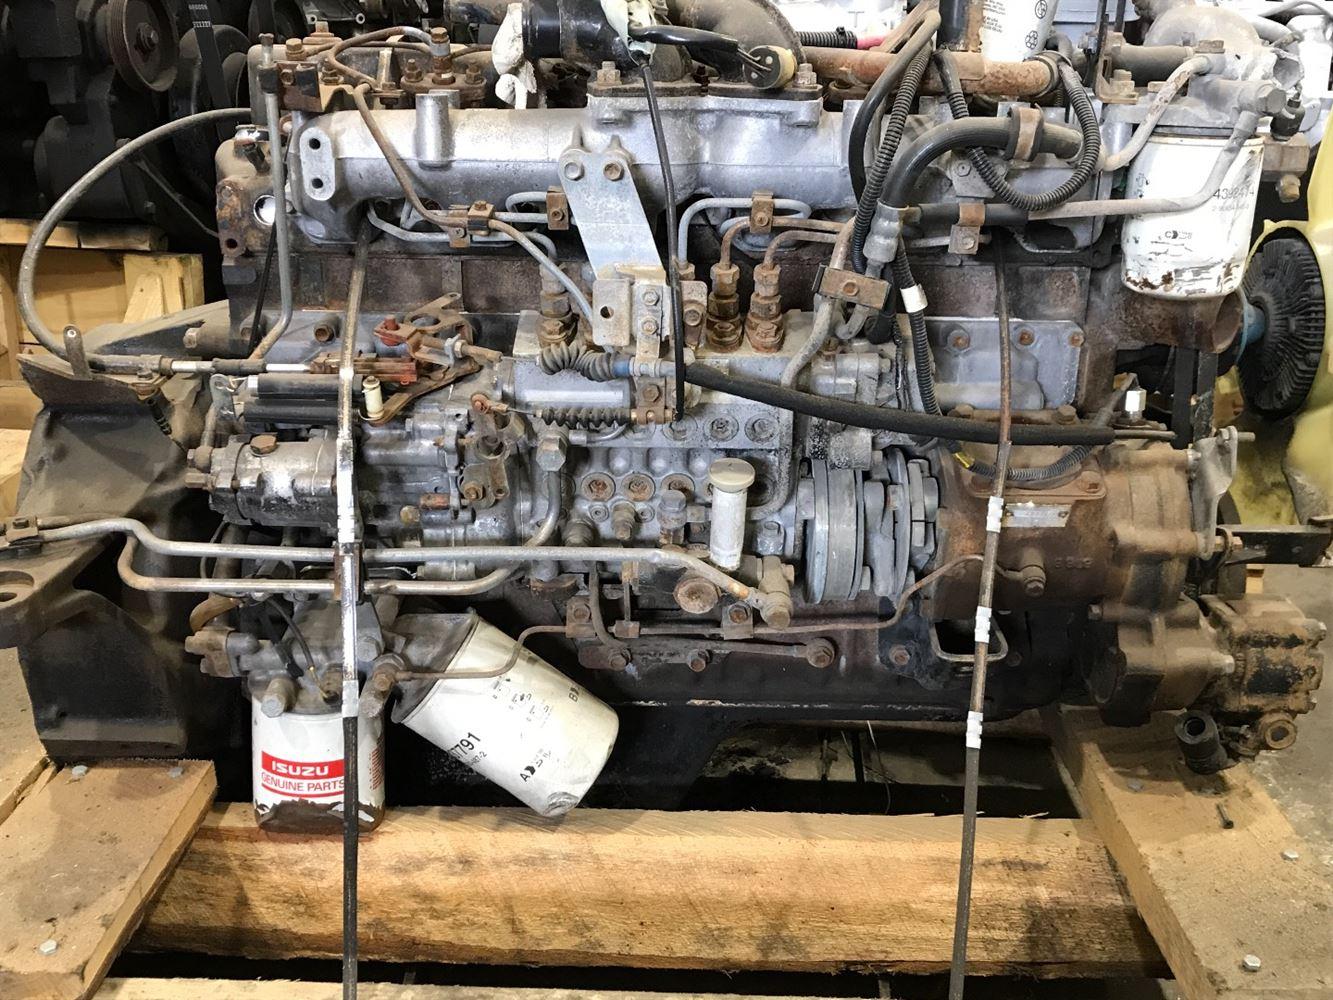 1993 ISUZU OTHER ENGINE ASSEMBLY TRUCK PARTS #680127